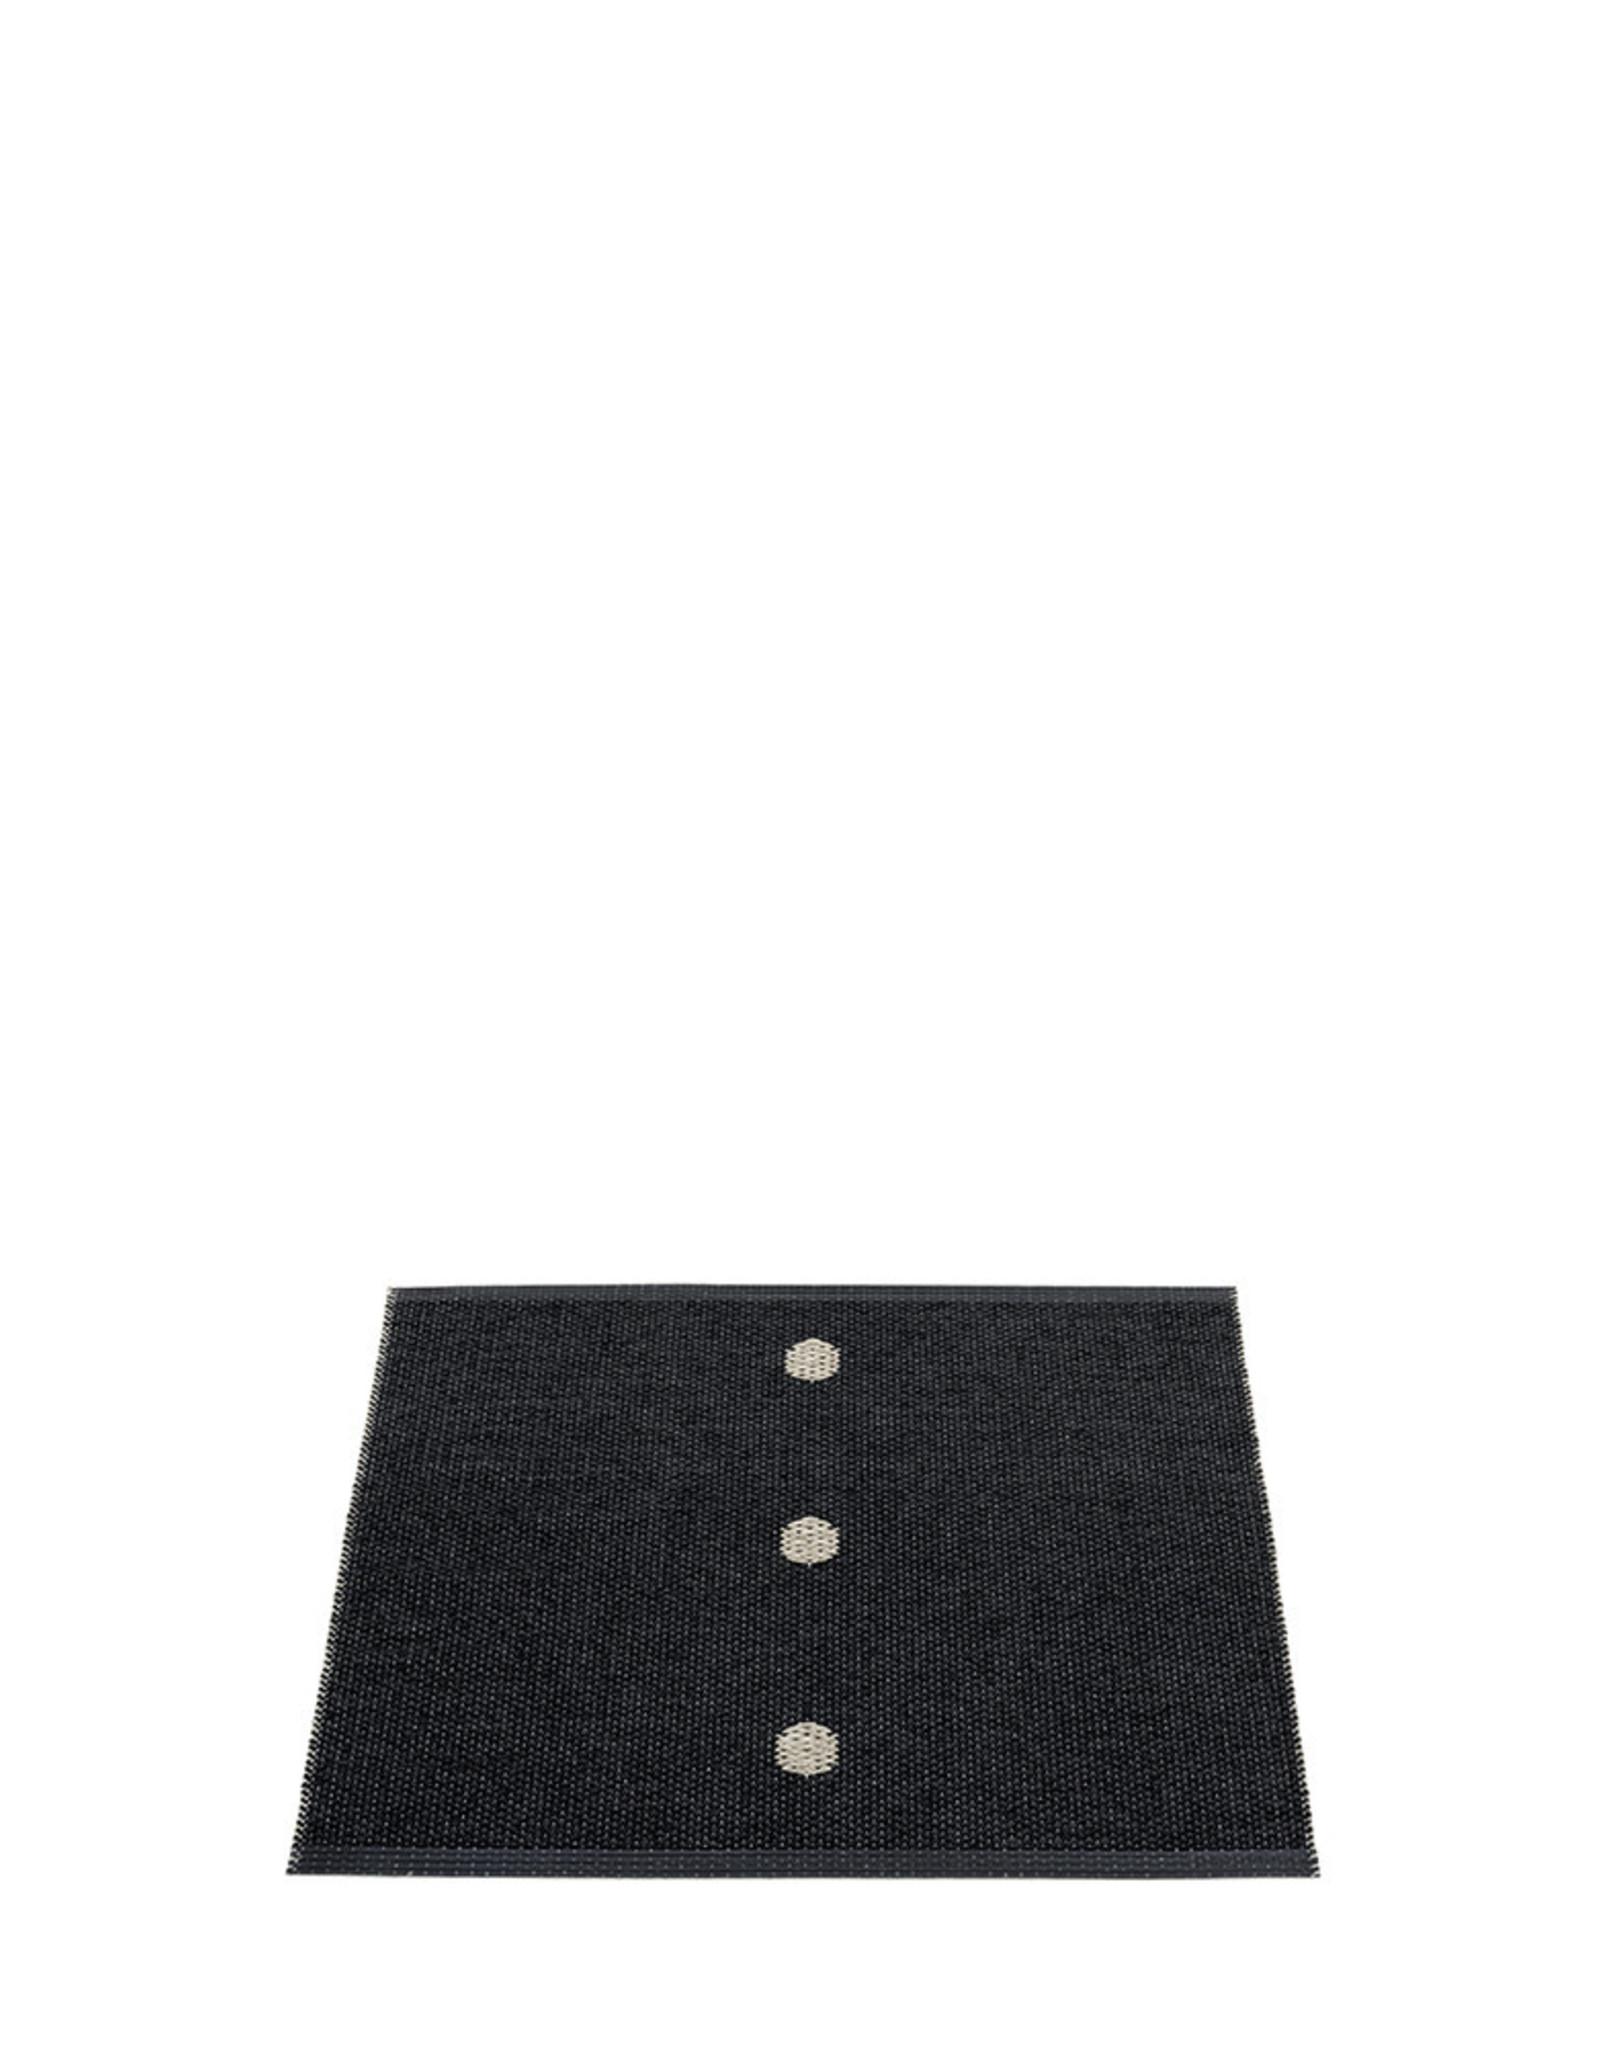 Pappelina Tapis Peg Black/ Linen